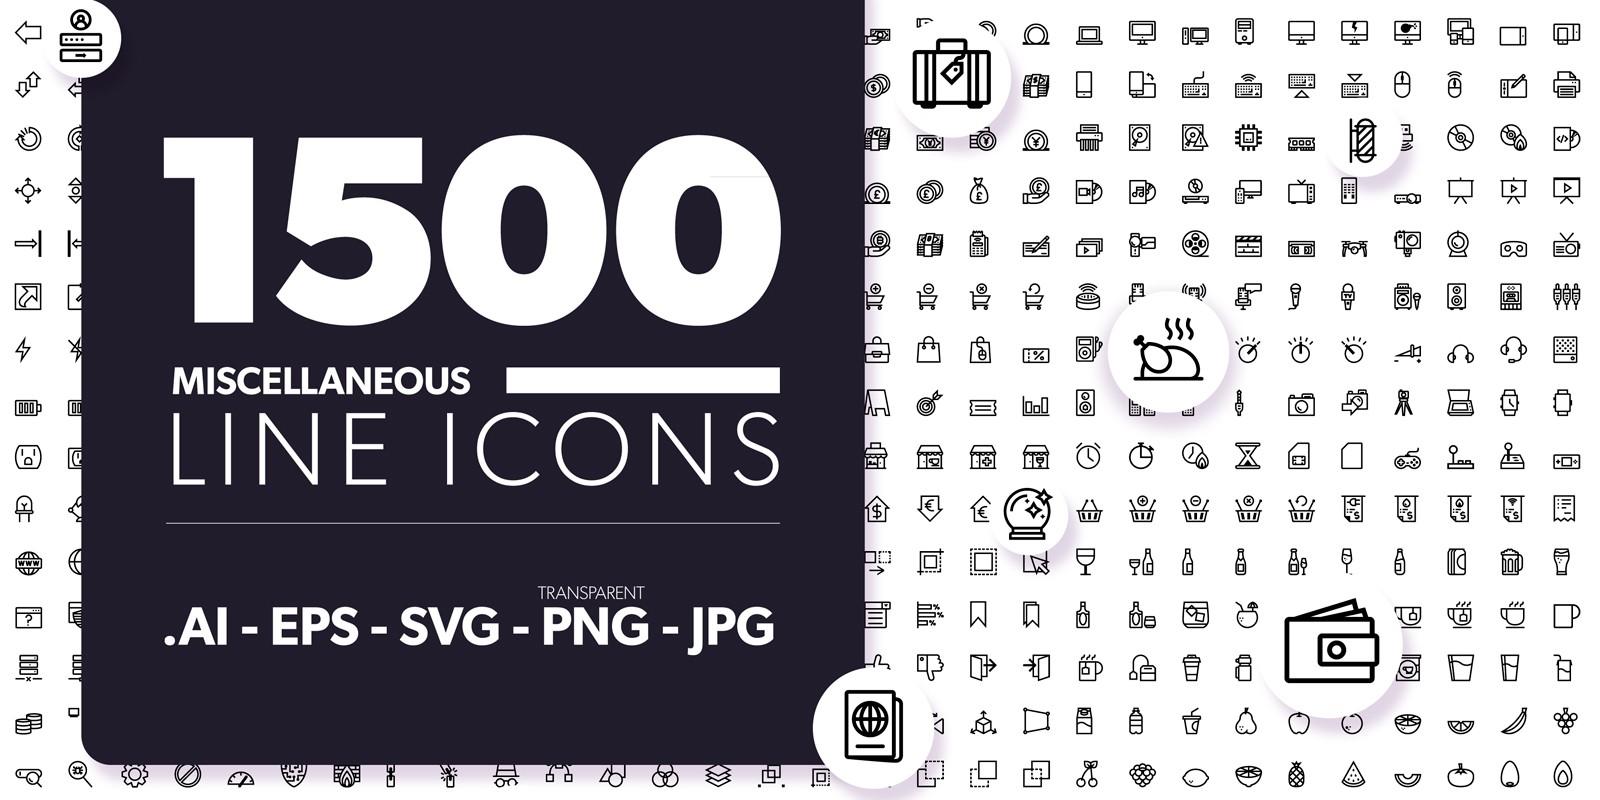 1500 Miscellaneous Line Icons